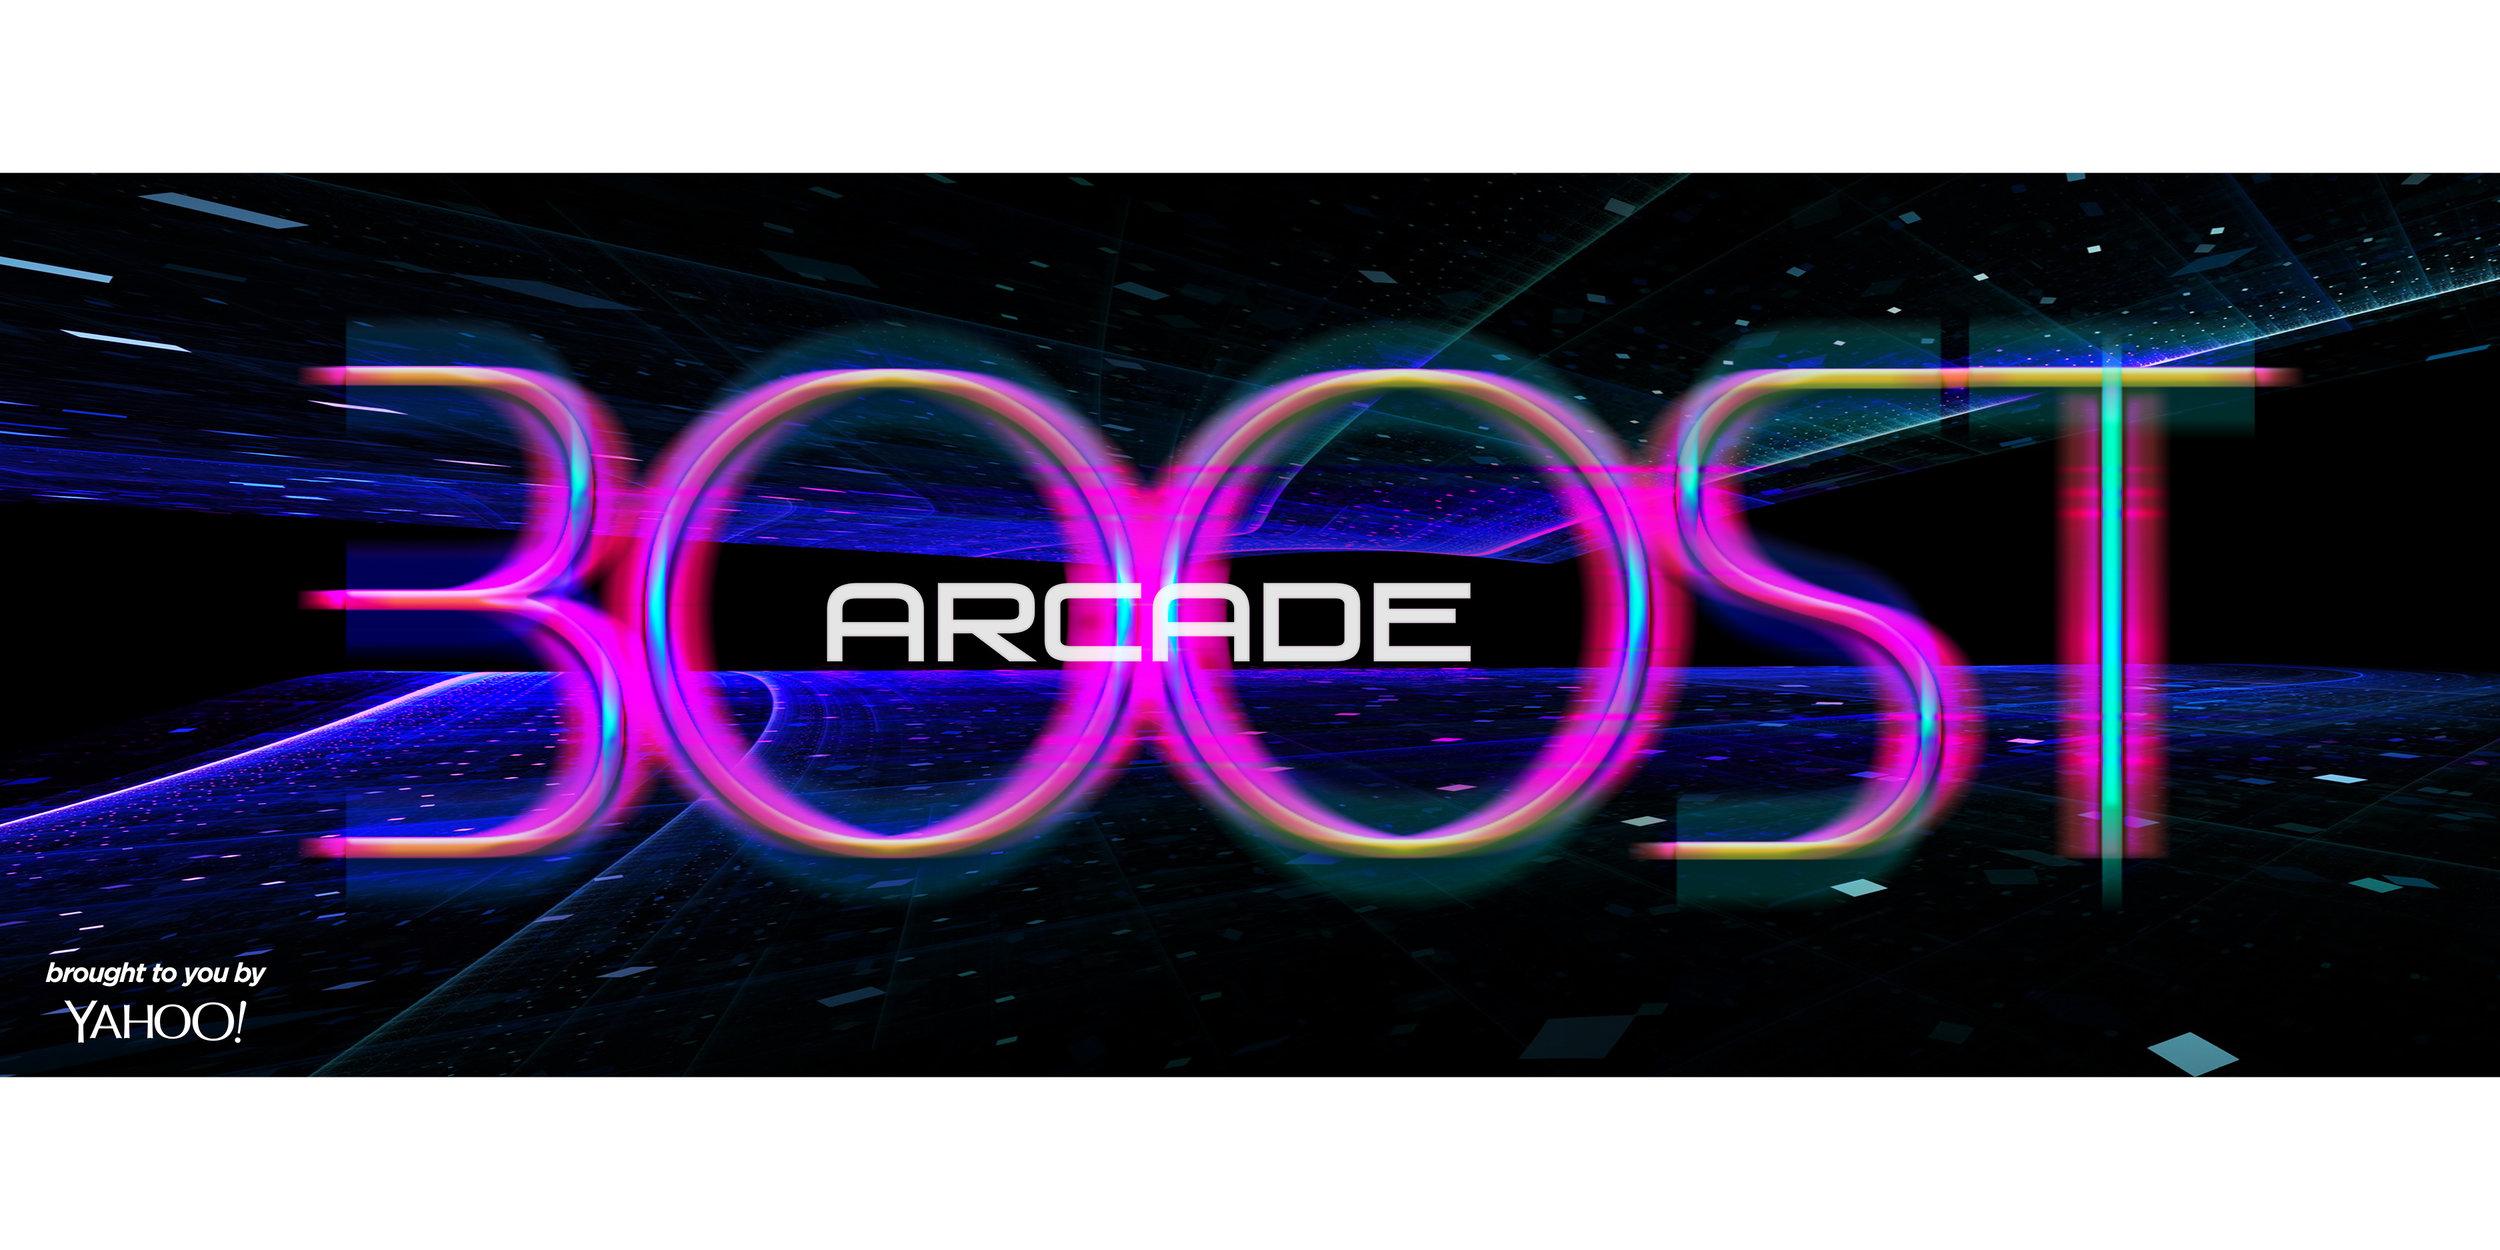 Arcade Comps34.jpg